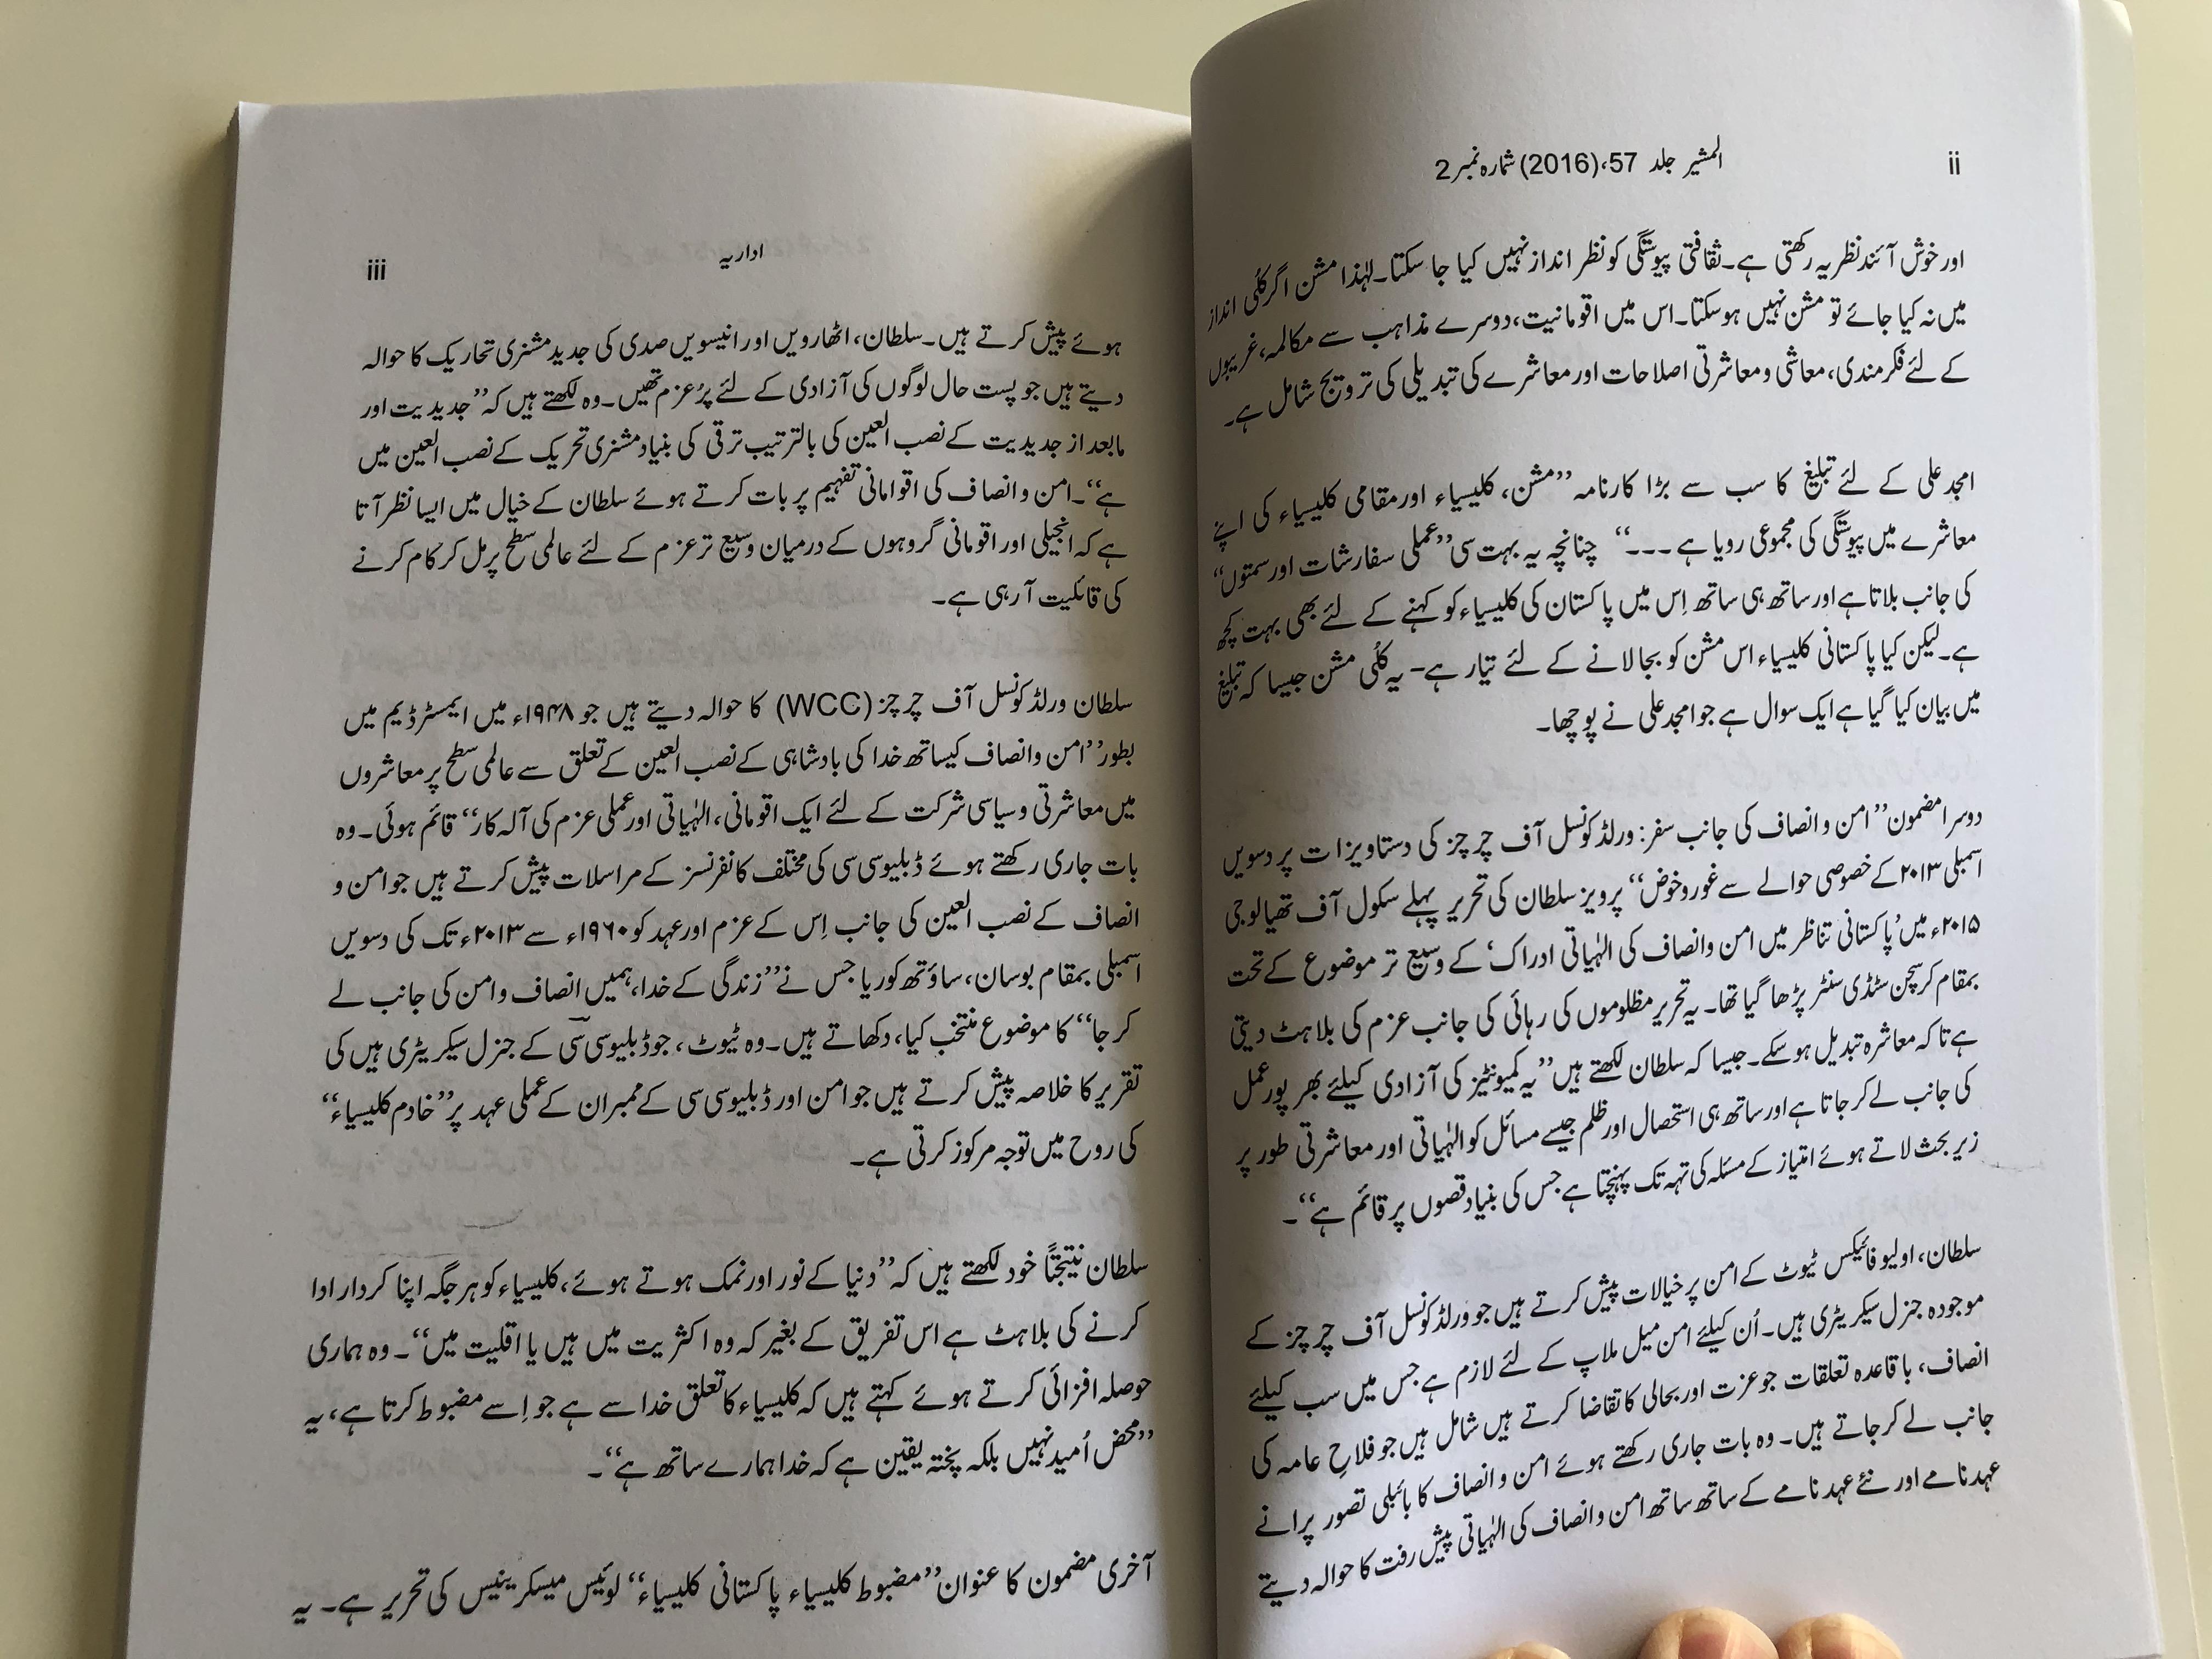 al-mushir-the-counselor-volume-57.-no.-2-11.jpg